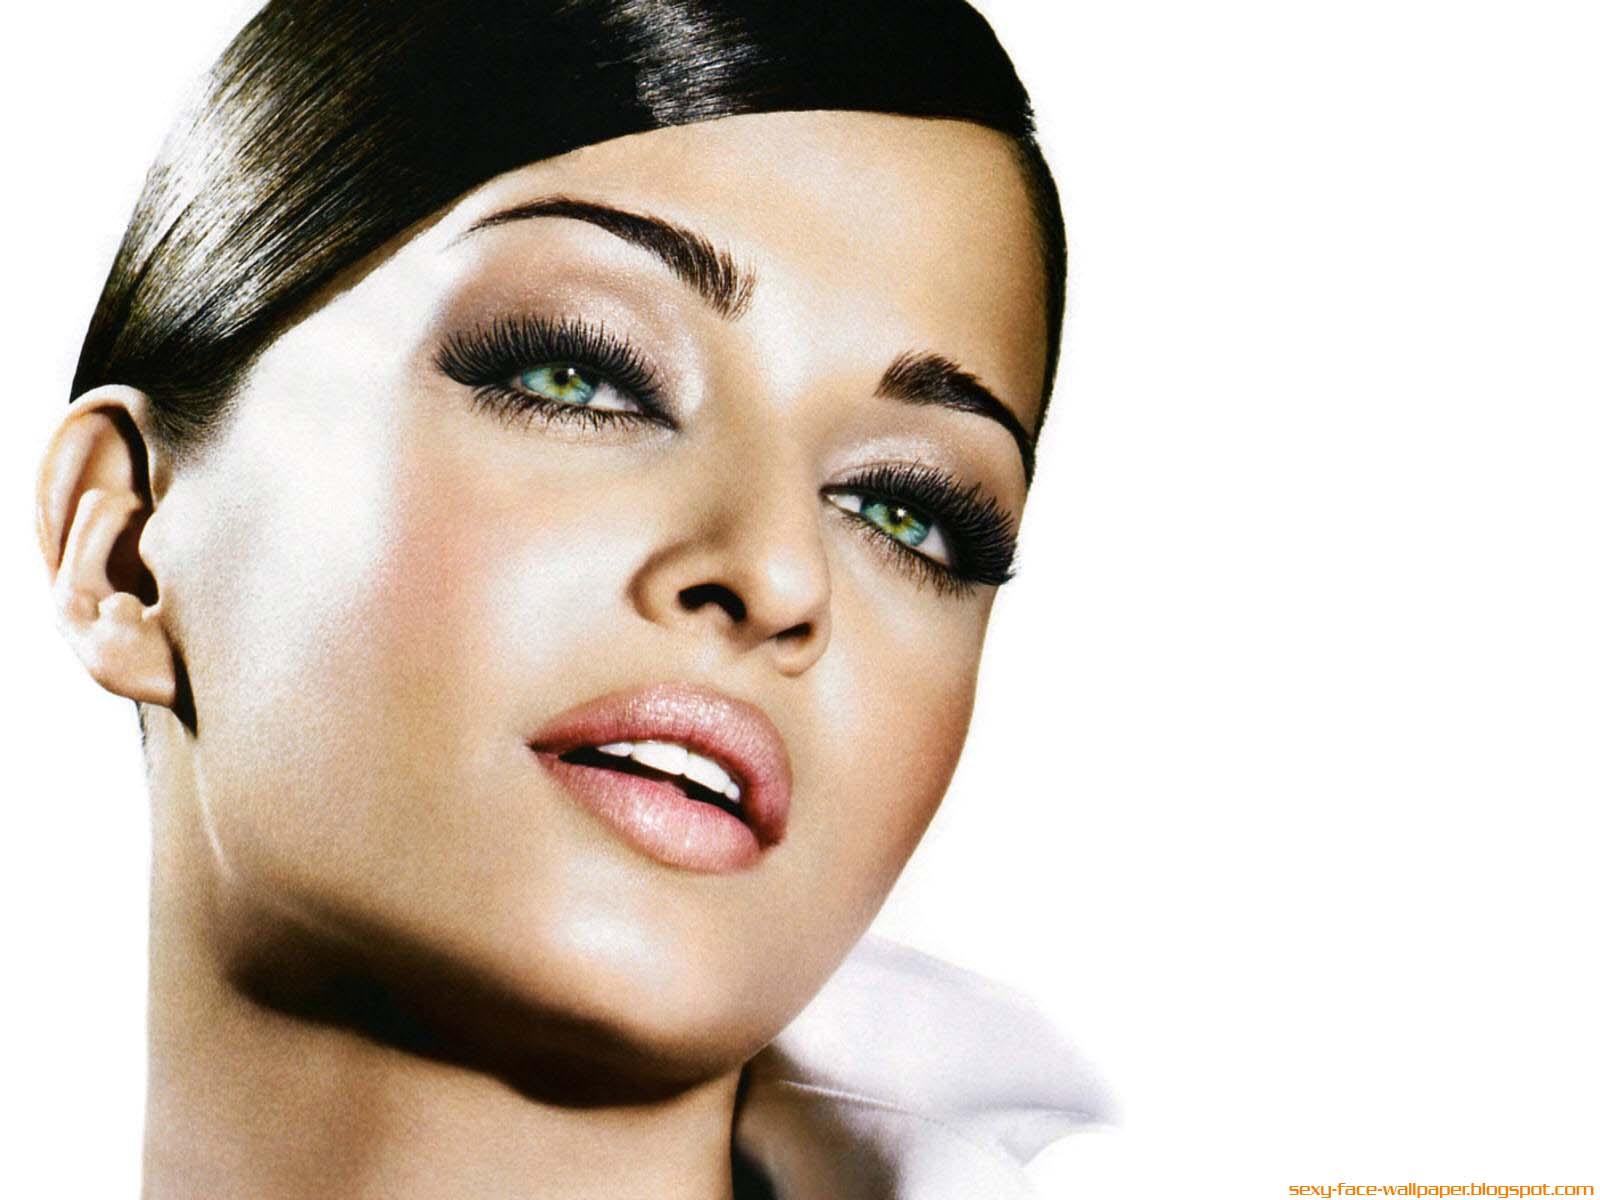 http://1.bp.blogspot.com/_b5gkGMQDebI/S6nq11I60xI/AAAAAAAAAk8/-8Etg-oOgBY/s1600/Aishwarya+Rai+Hot+Face.jpg